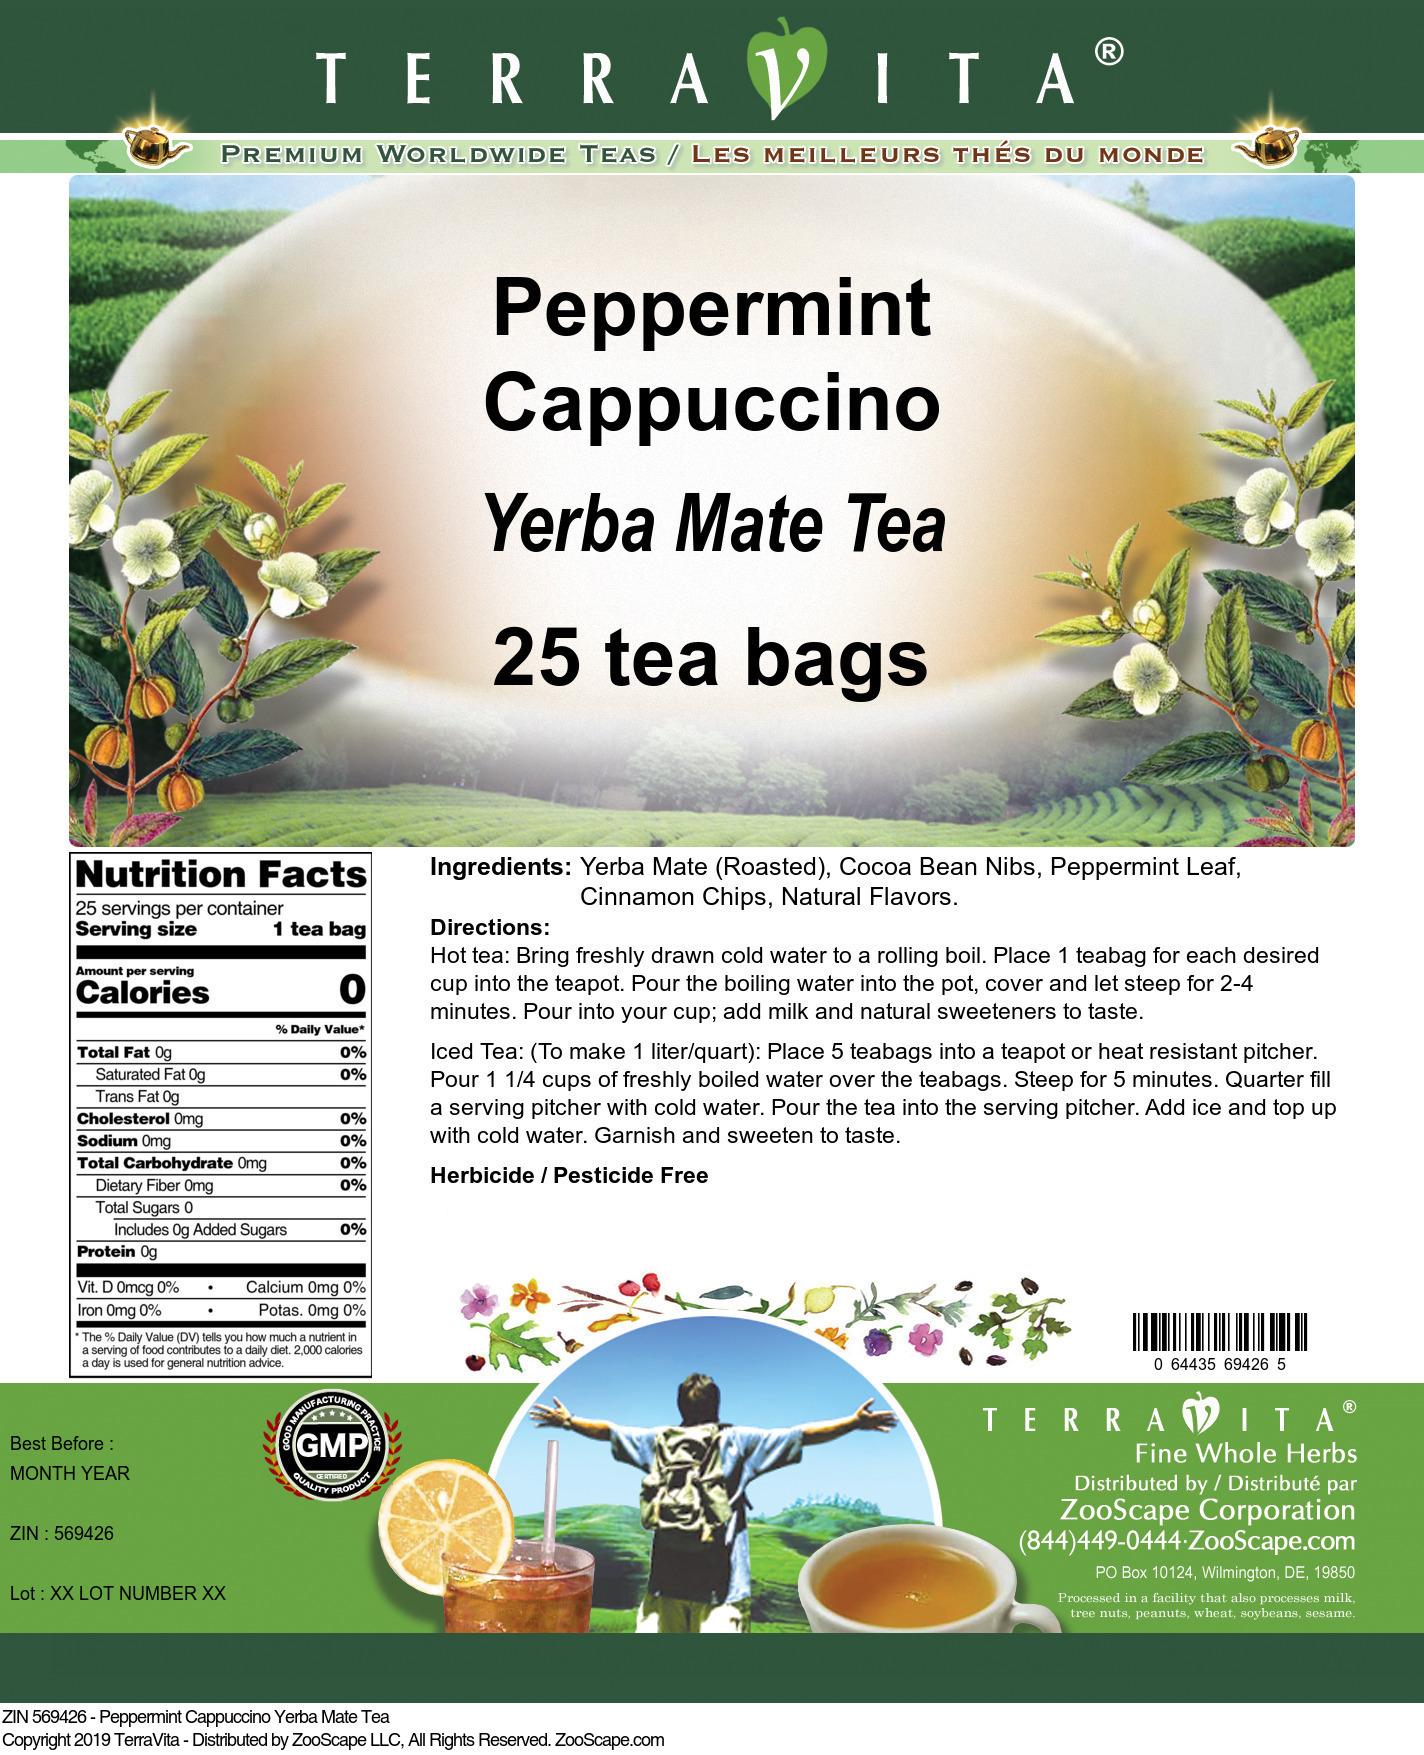 Peppermint Cappuccino Yerba Mate Tea